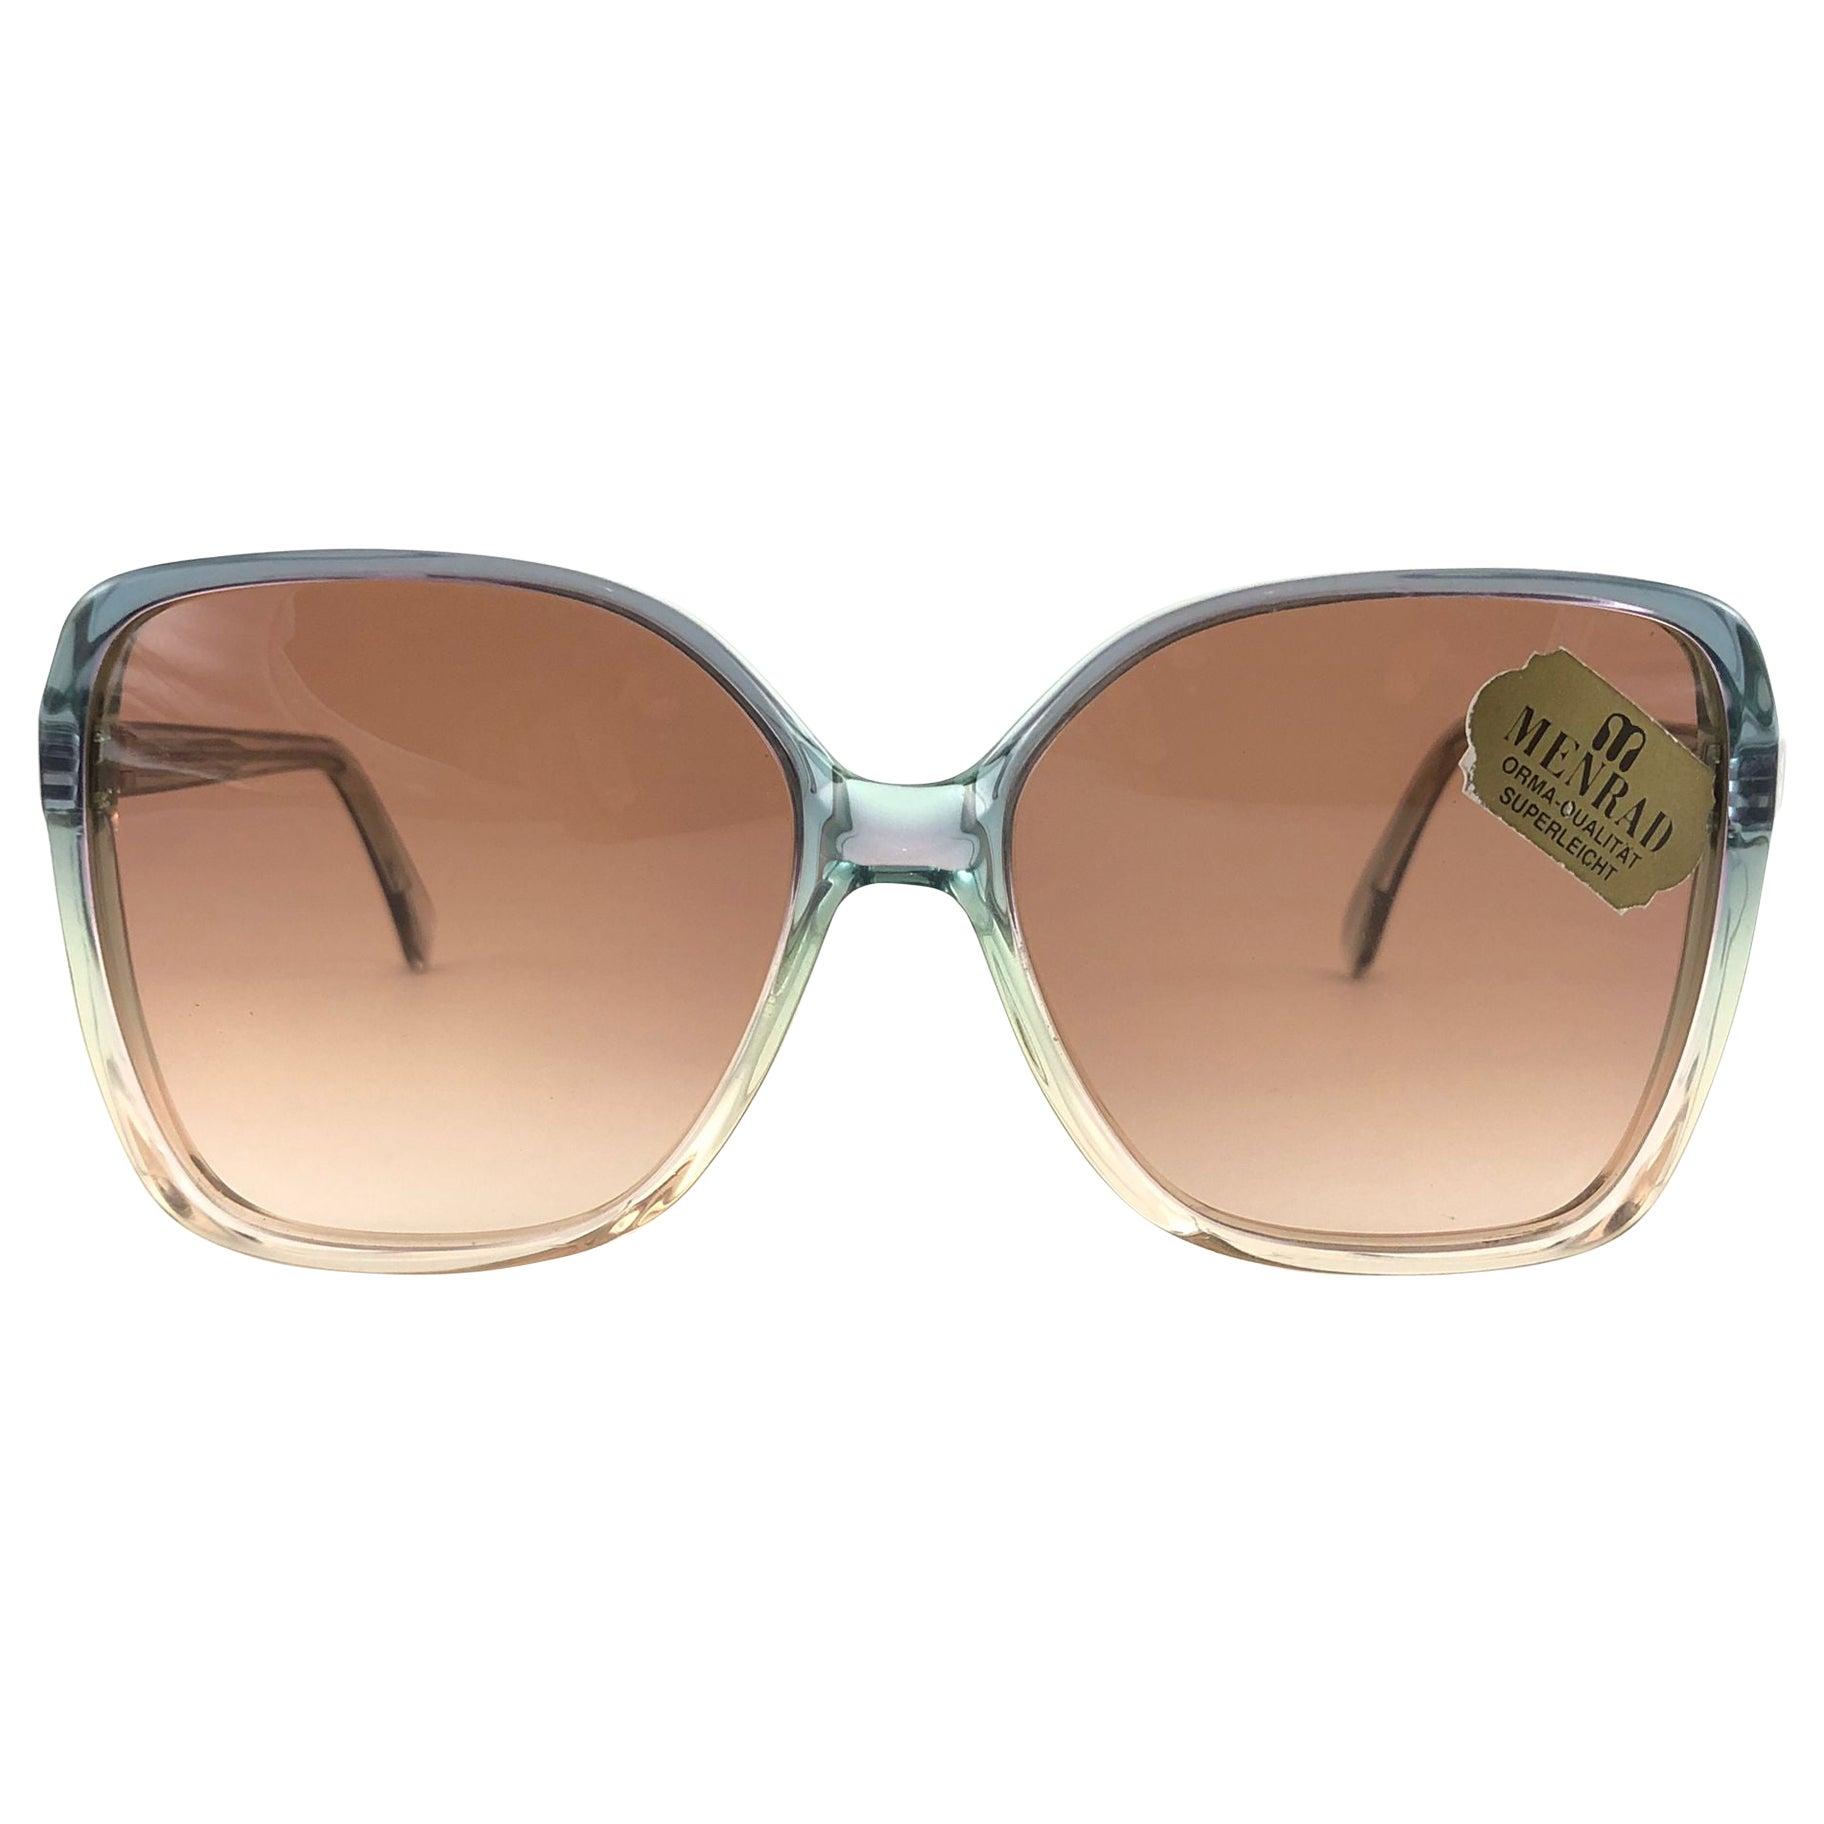 Vintage Rare Menrad M742 Funky Oversized  1970 Sunglasses